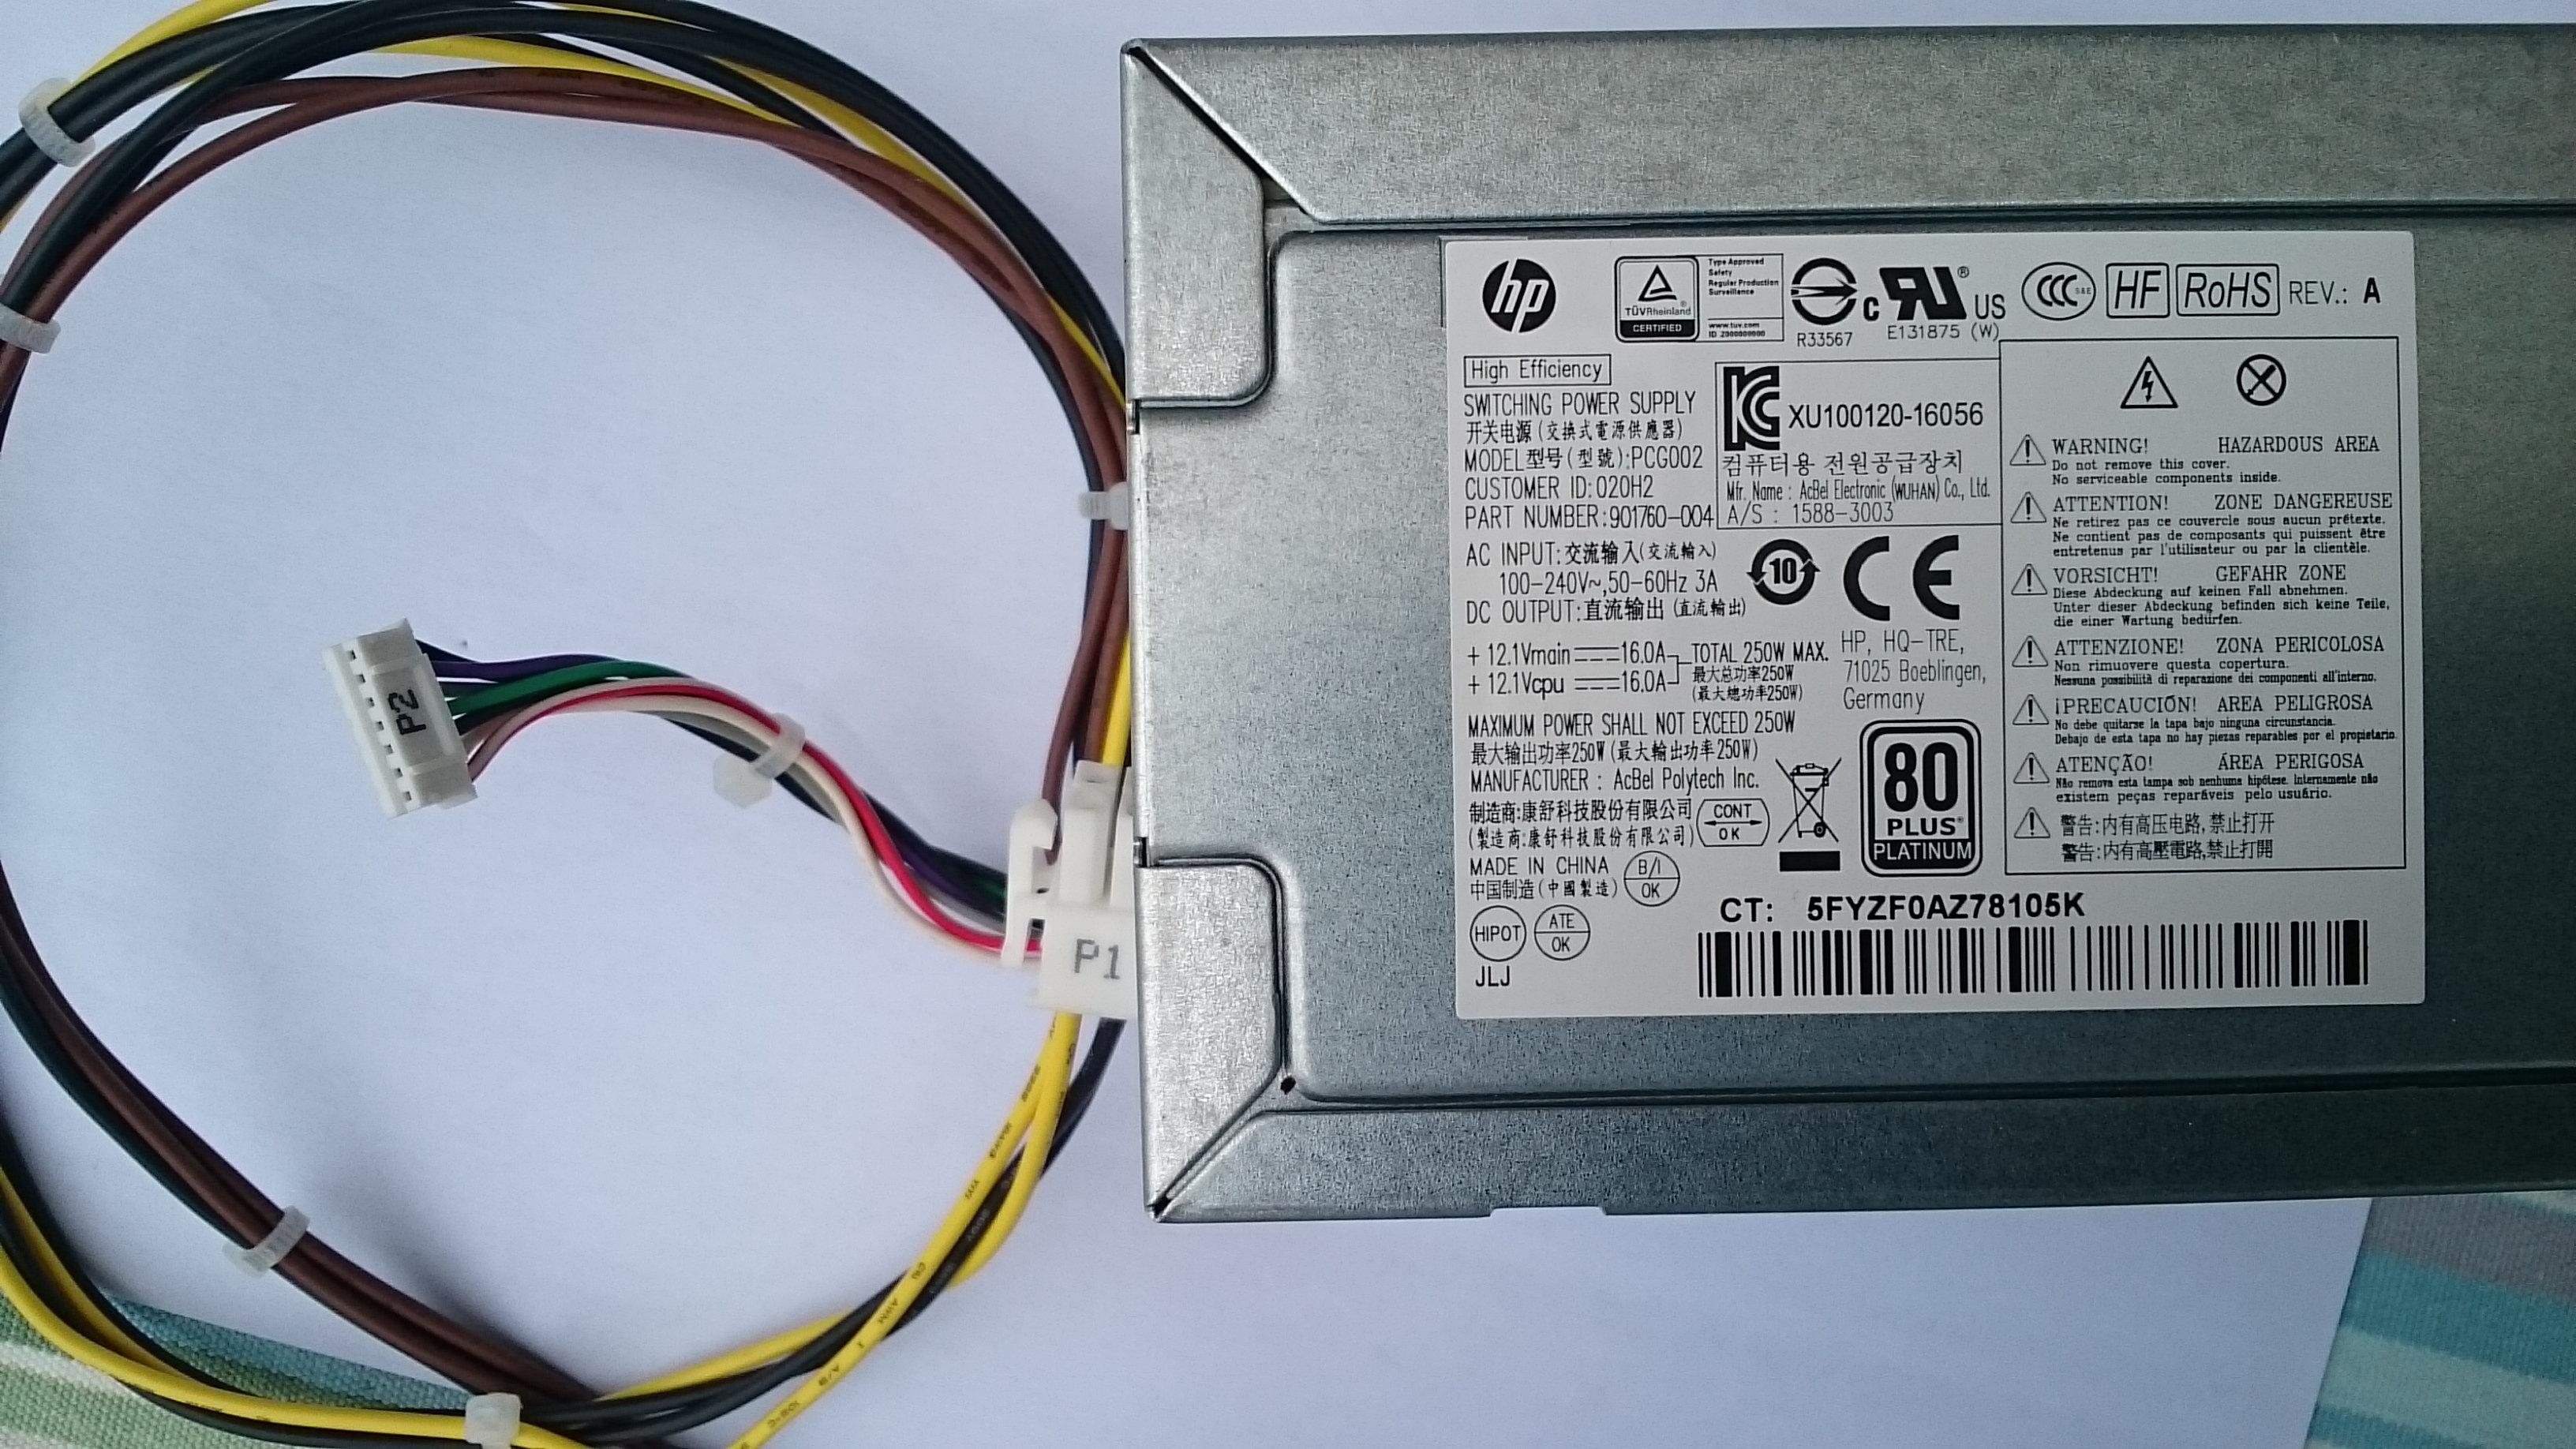 P Elite Desk 800 G3 Power Supply Upgrade Hp Support Community 6369136